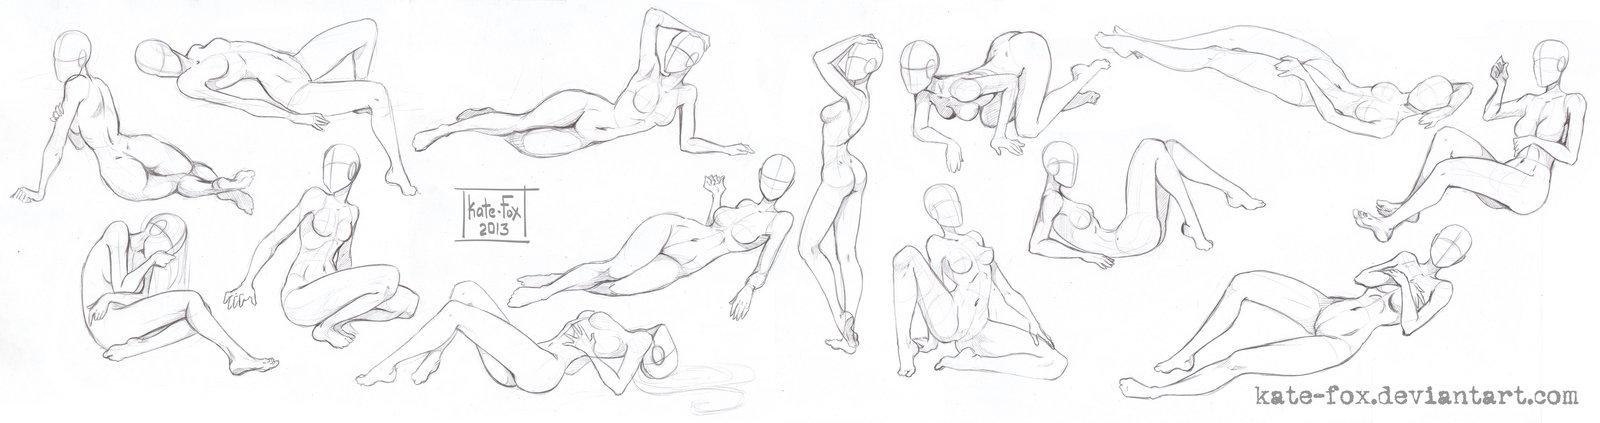 1600x423 Base Like References, Female On Drawingbases